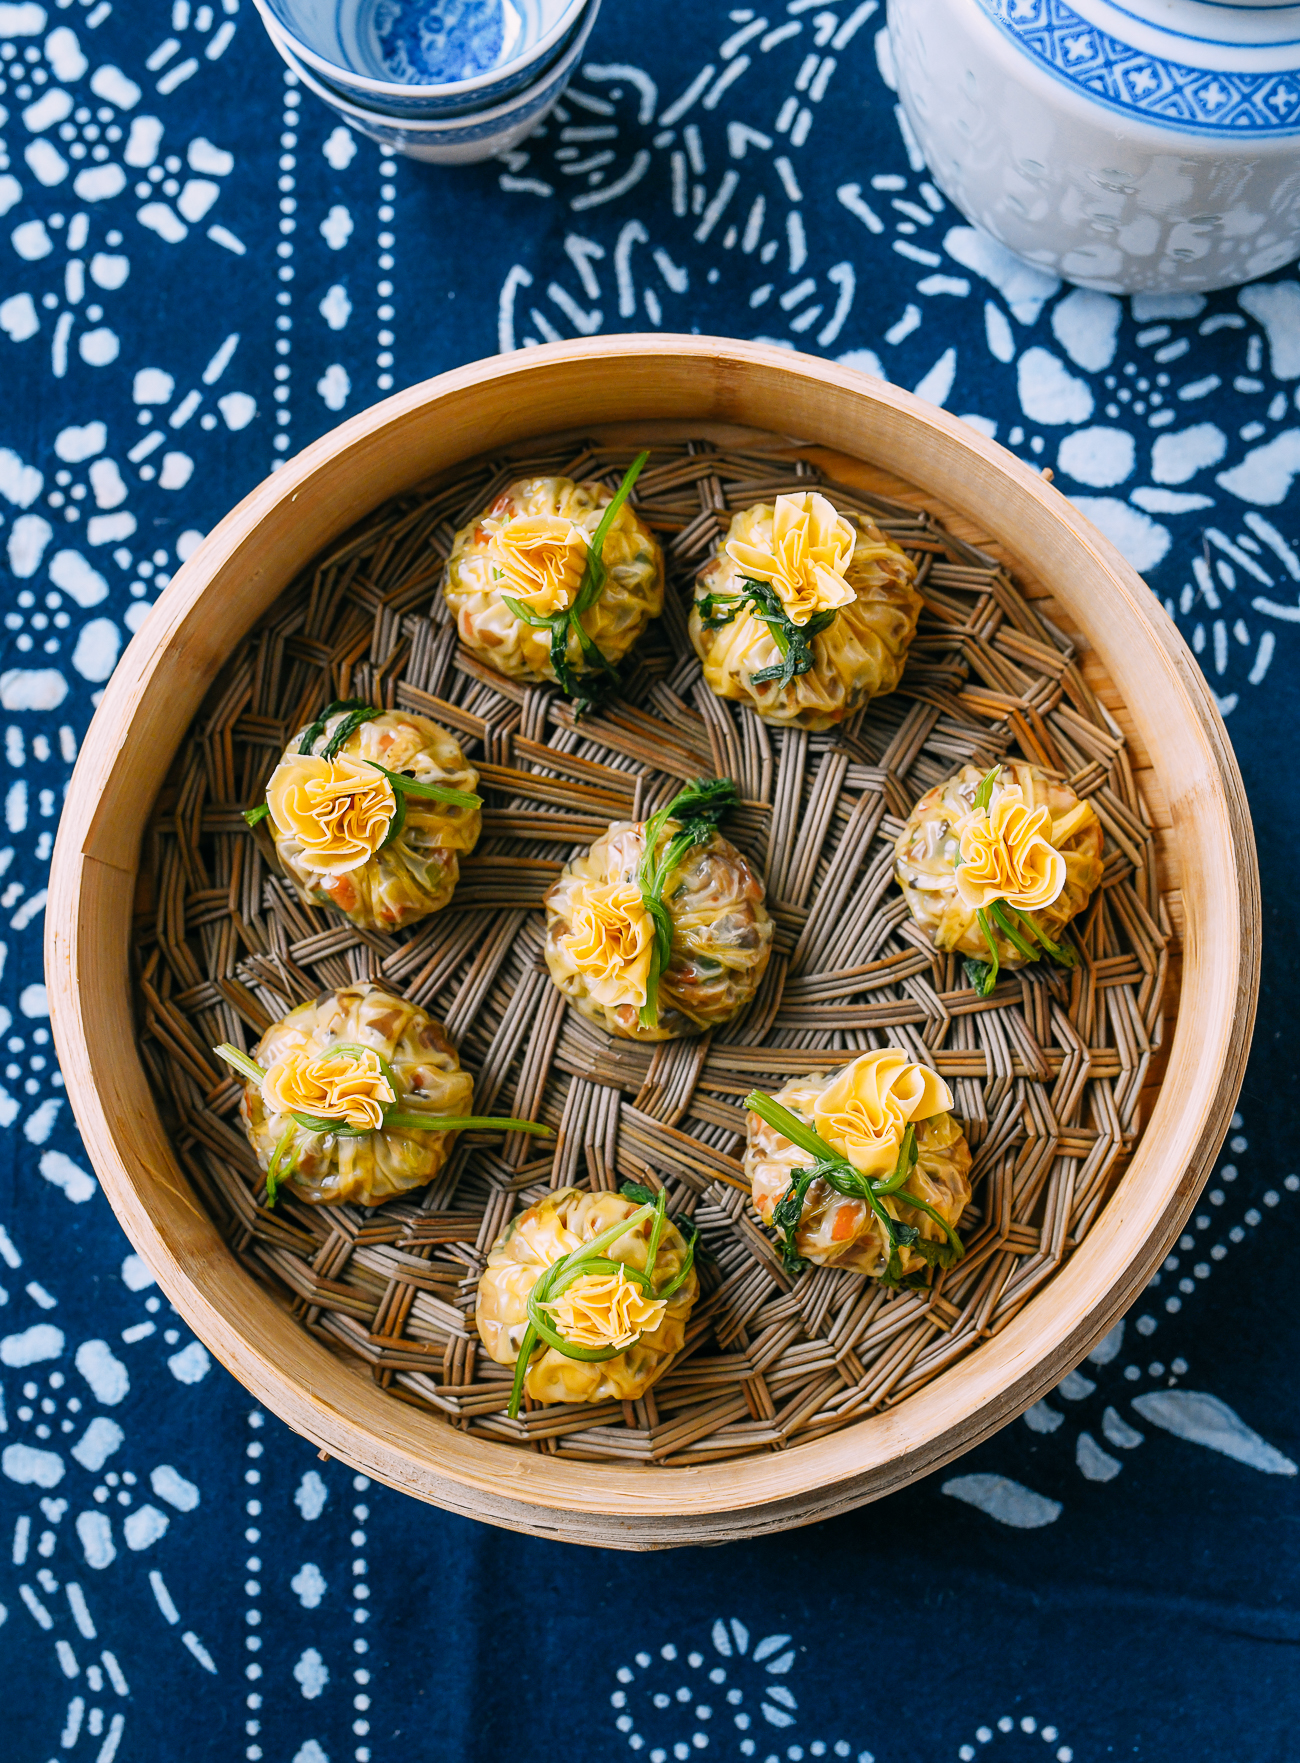 Steamed Golden Purse Dumplings